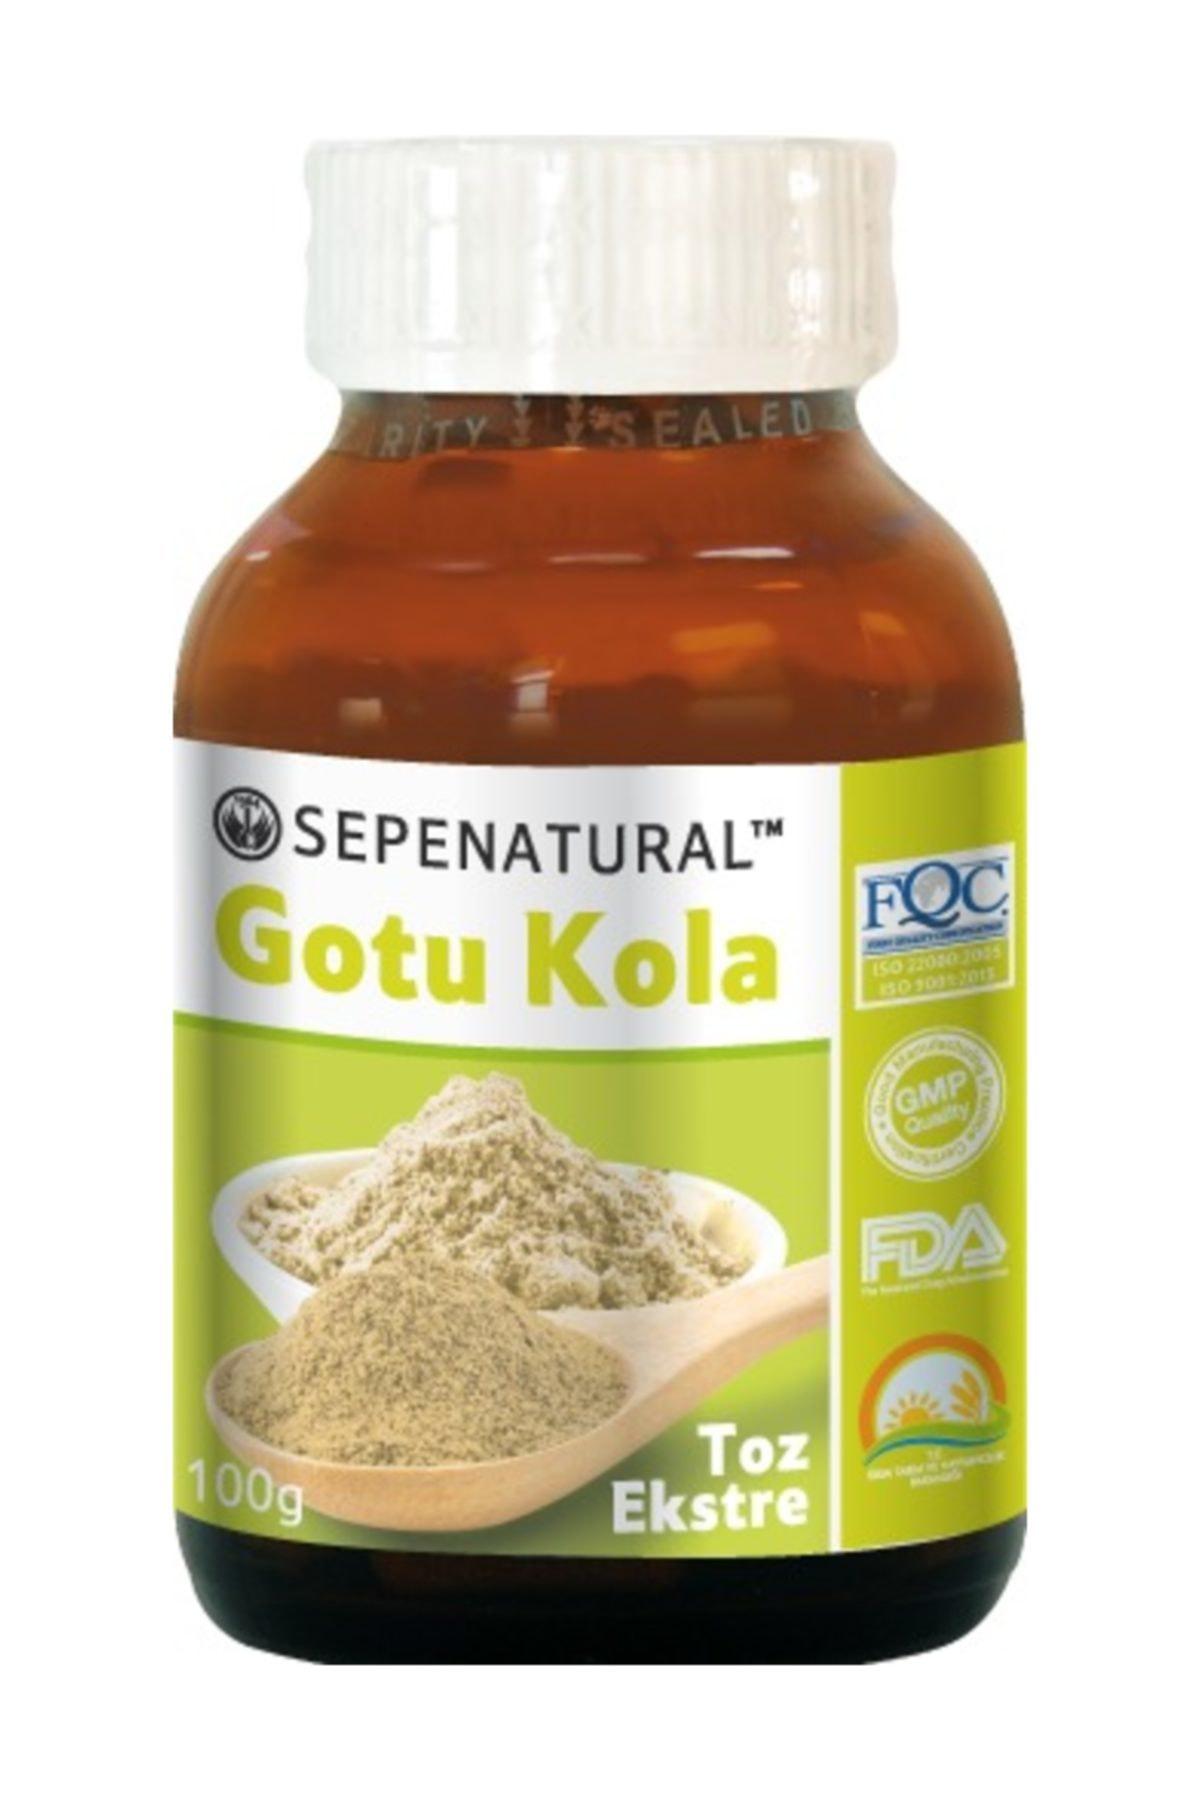 Sepe Natural Gotu Kola Extract Gotu Kola Toz Ekstrakt Ekstresi 100 Gr 1